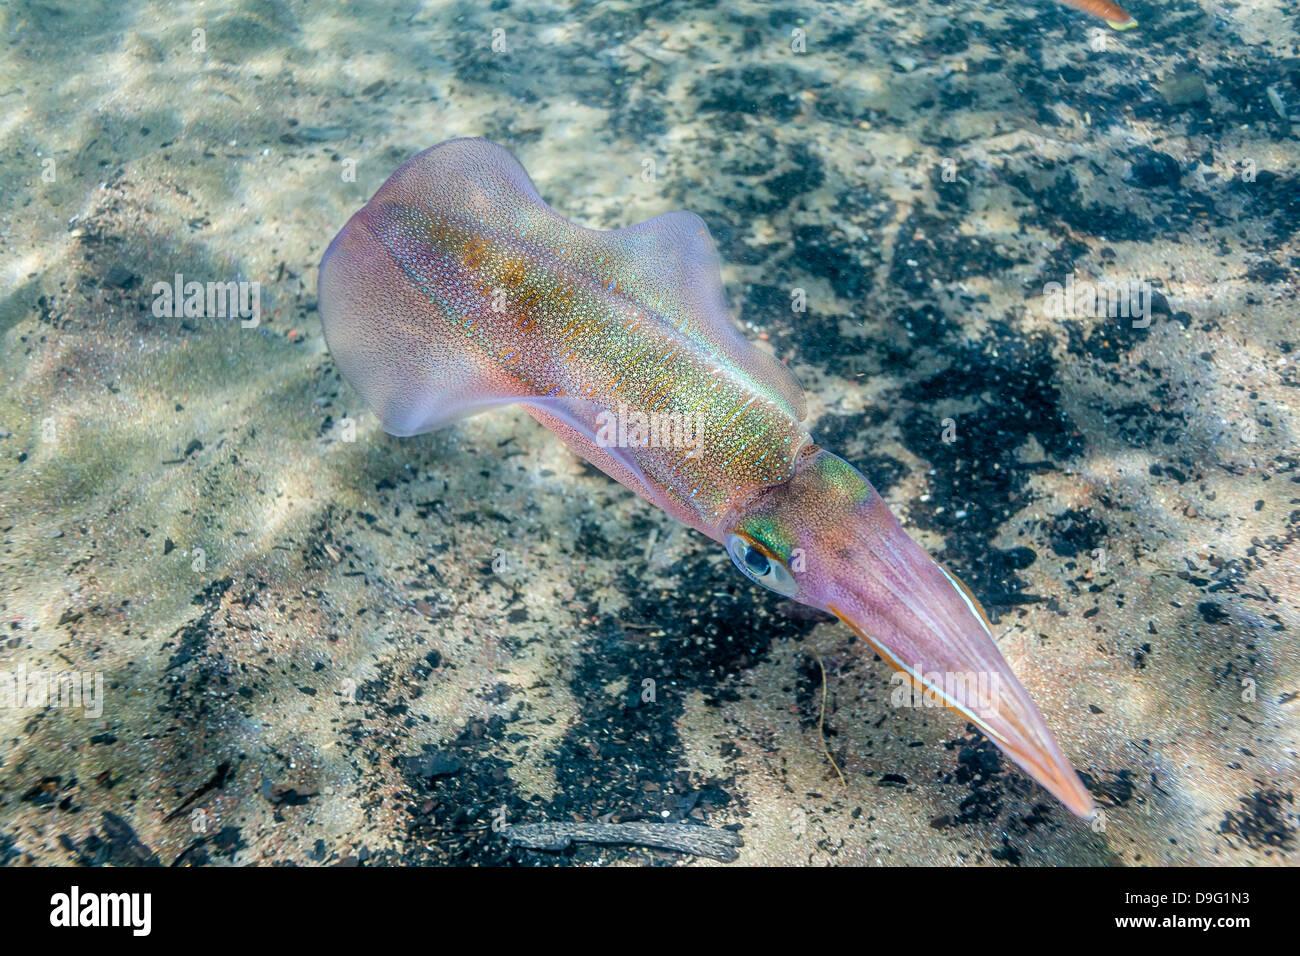 Oval squid (Sepioteuthis lessoniana), Honolua Bay, West Maui, Hawaii, United States of America - Stock Image